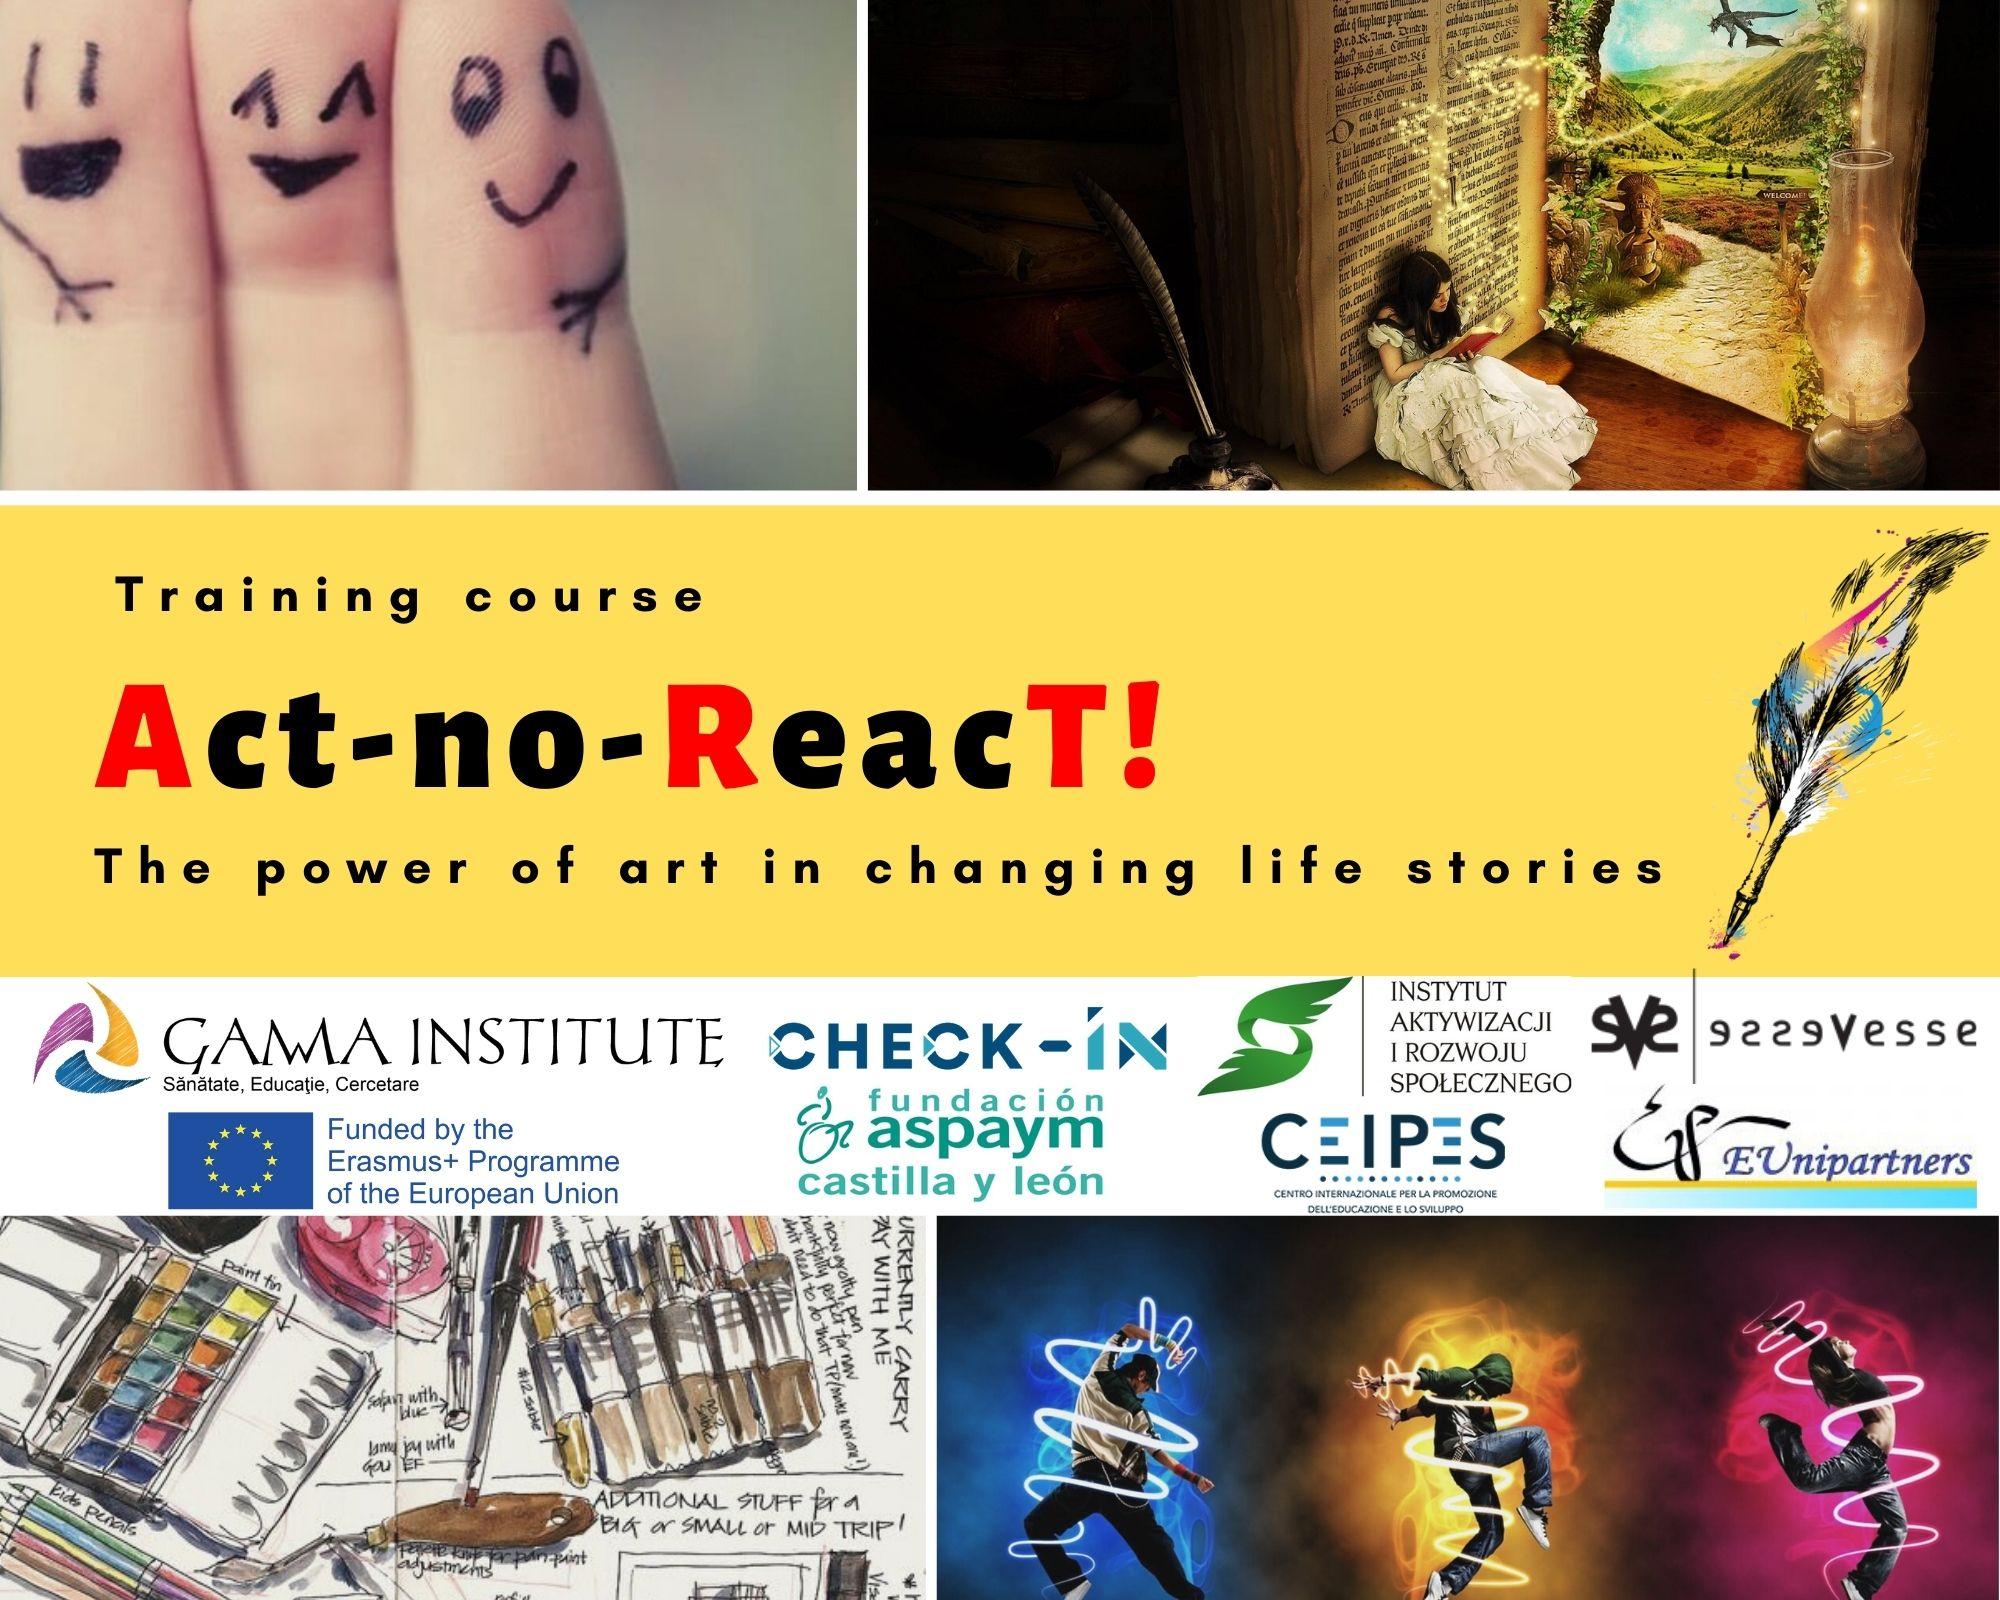 act-no-react_-_poster_site_0.jpg